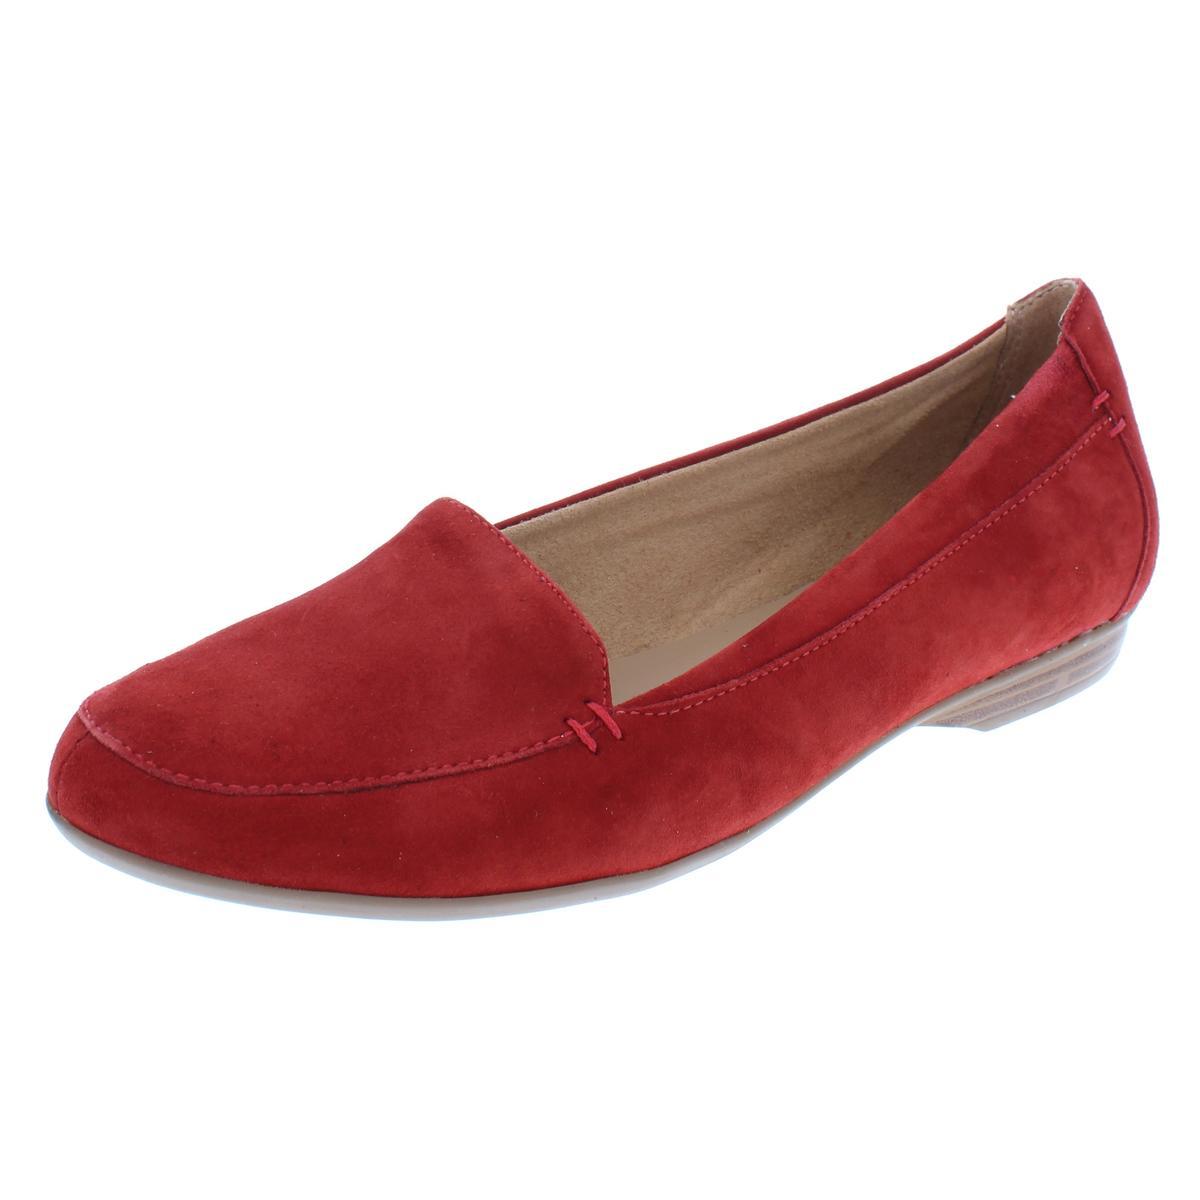 Naturalizer Damenschuhe Saban BHFO Solid Round Toe Casual Loafers Schuhes BHFO Saban 1181 633011